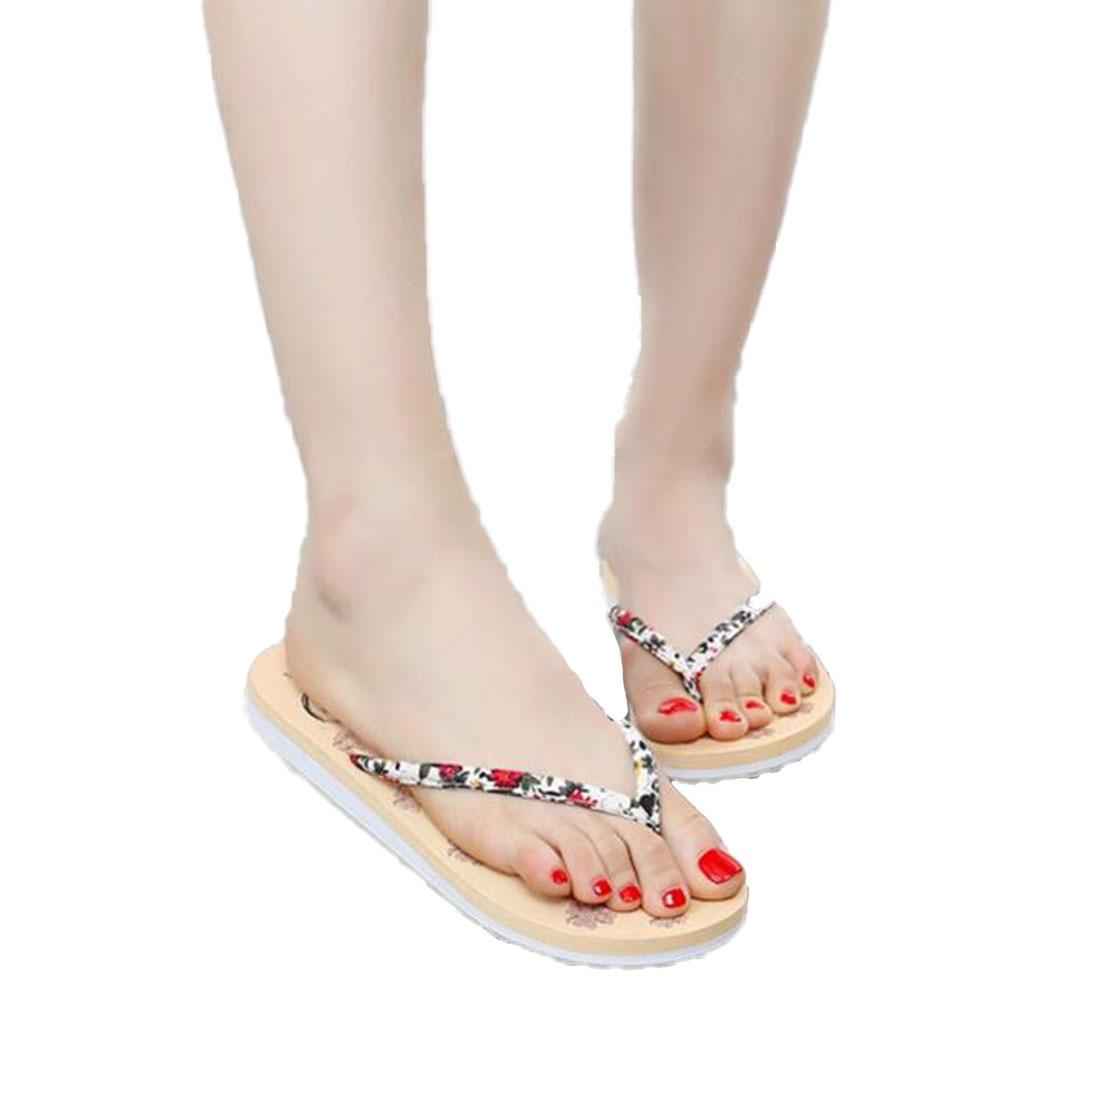 2017 Women sandals slippers shoes Caual Beach Flip Flops 3 Colors Summer Print Floral Bohemia Sandal Shoes for Woman pantufa casual wedges sandals 2017 summer beach women shoes platform flip flops print sandal comfort creepers shoes woman